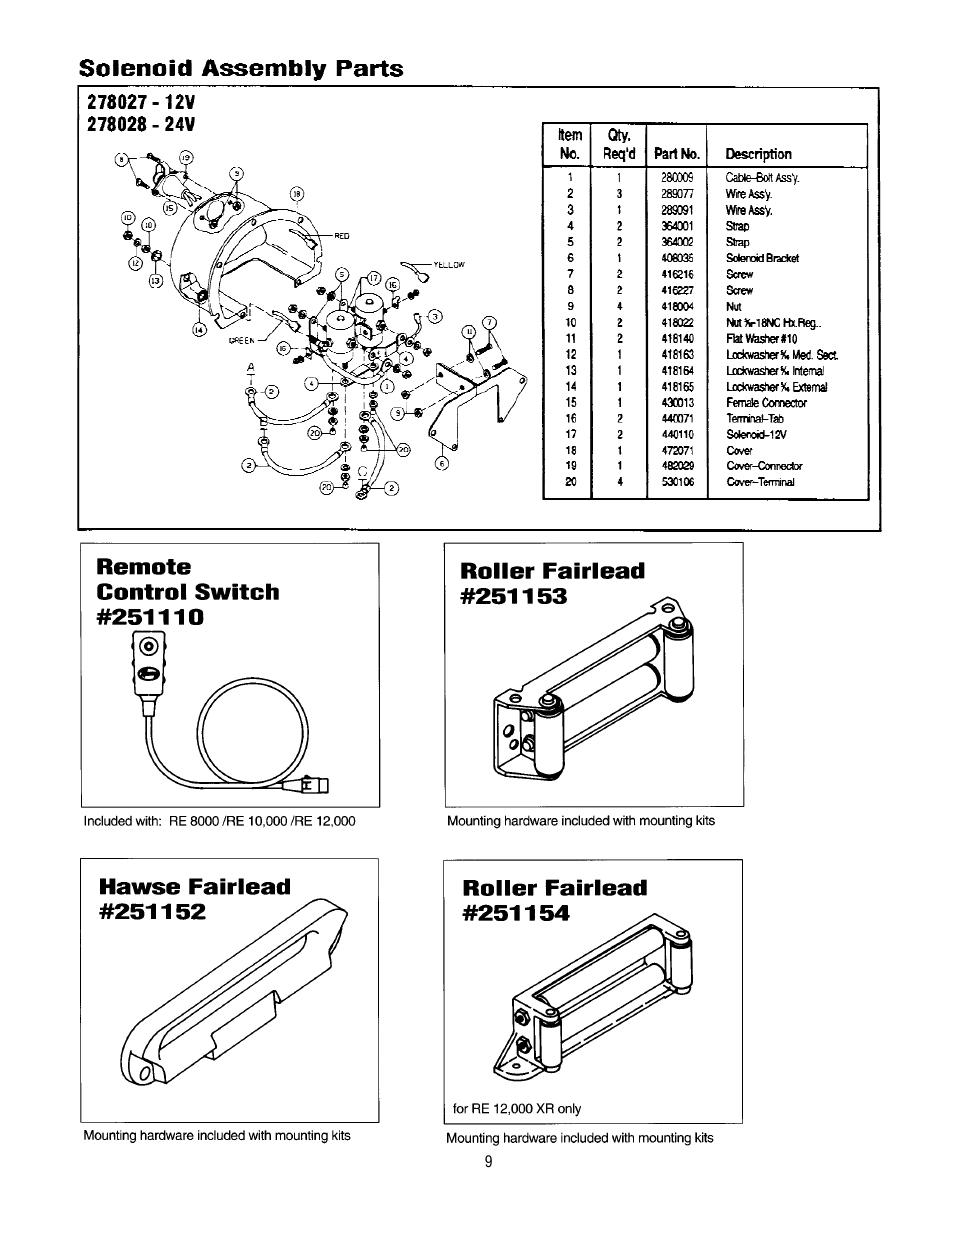 ramsey winch re 10000  12000  12000x user manual